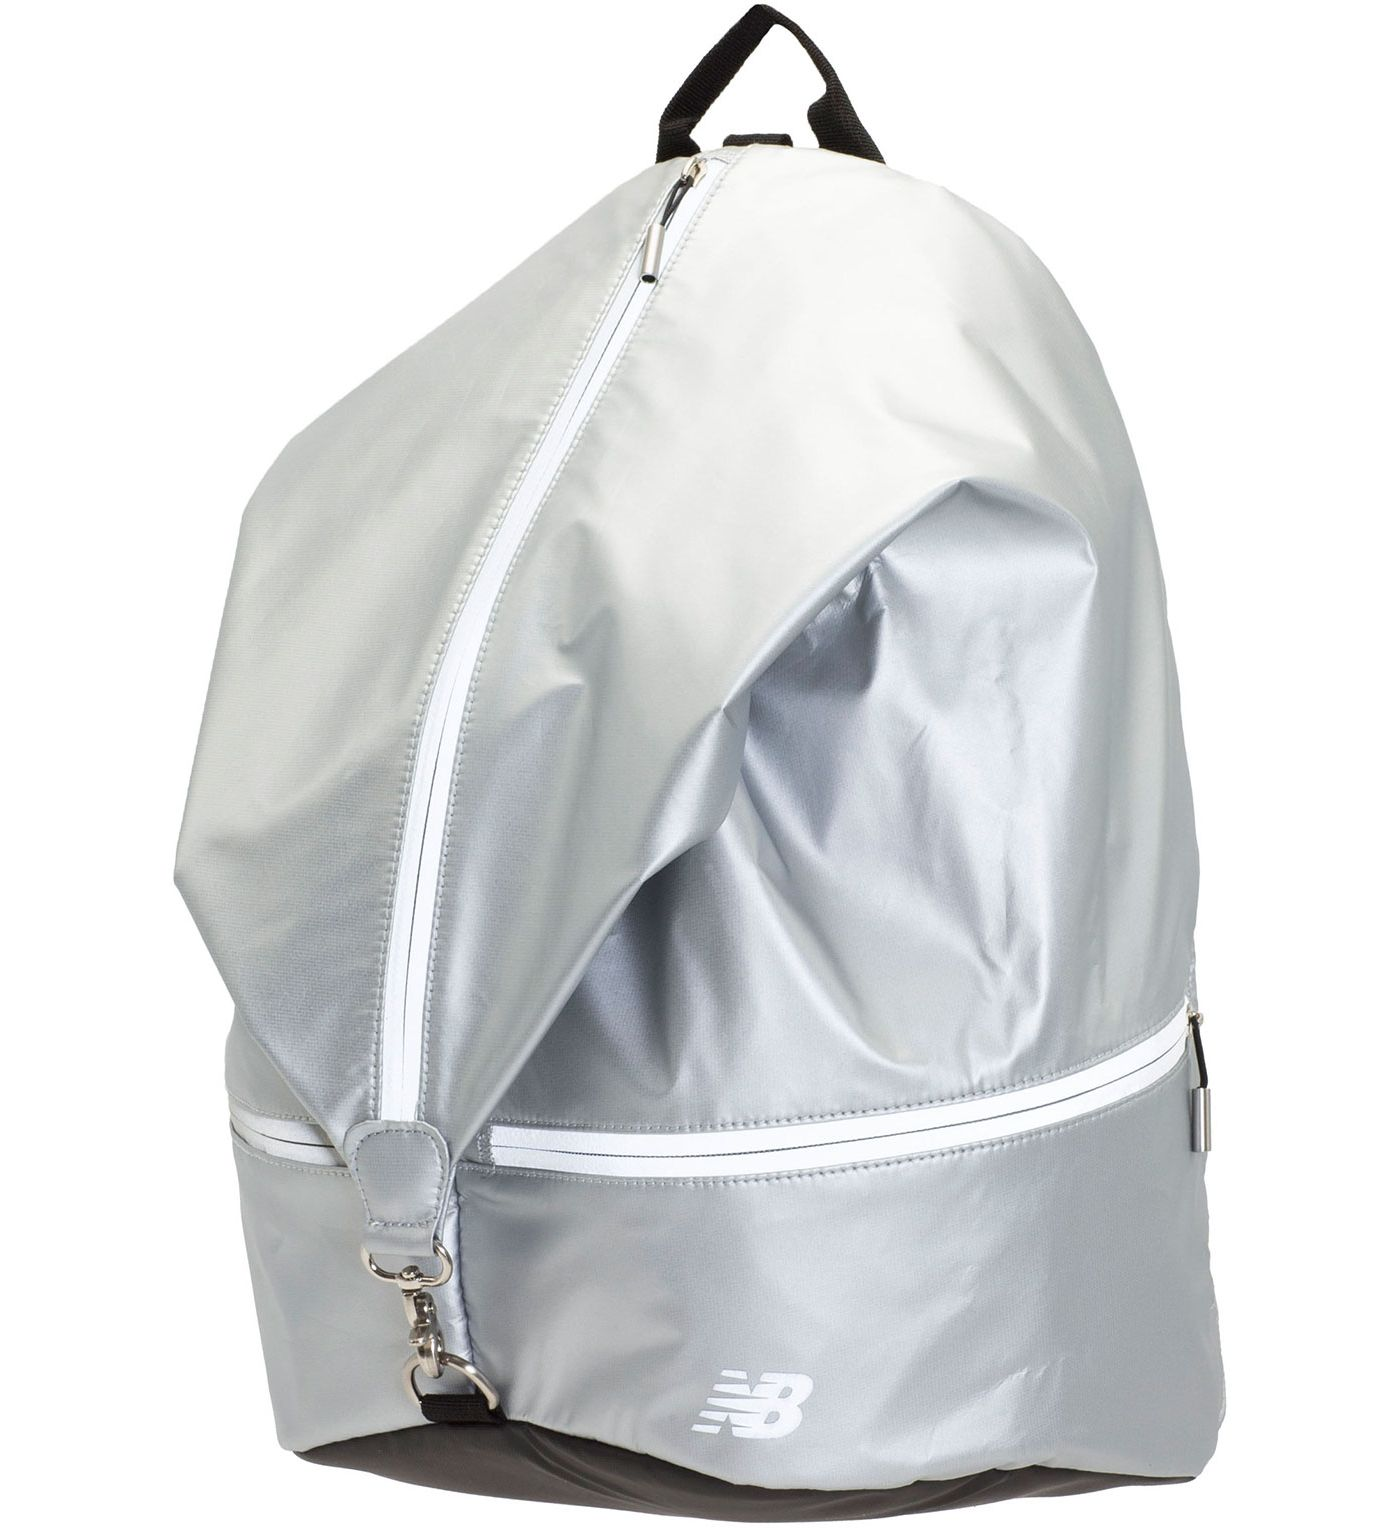 New Balance Women's Performance Backpack